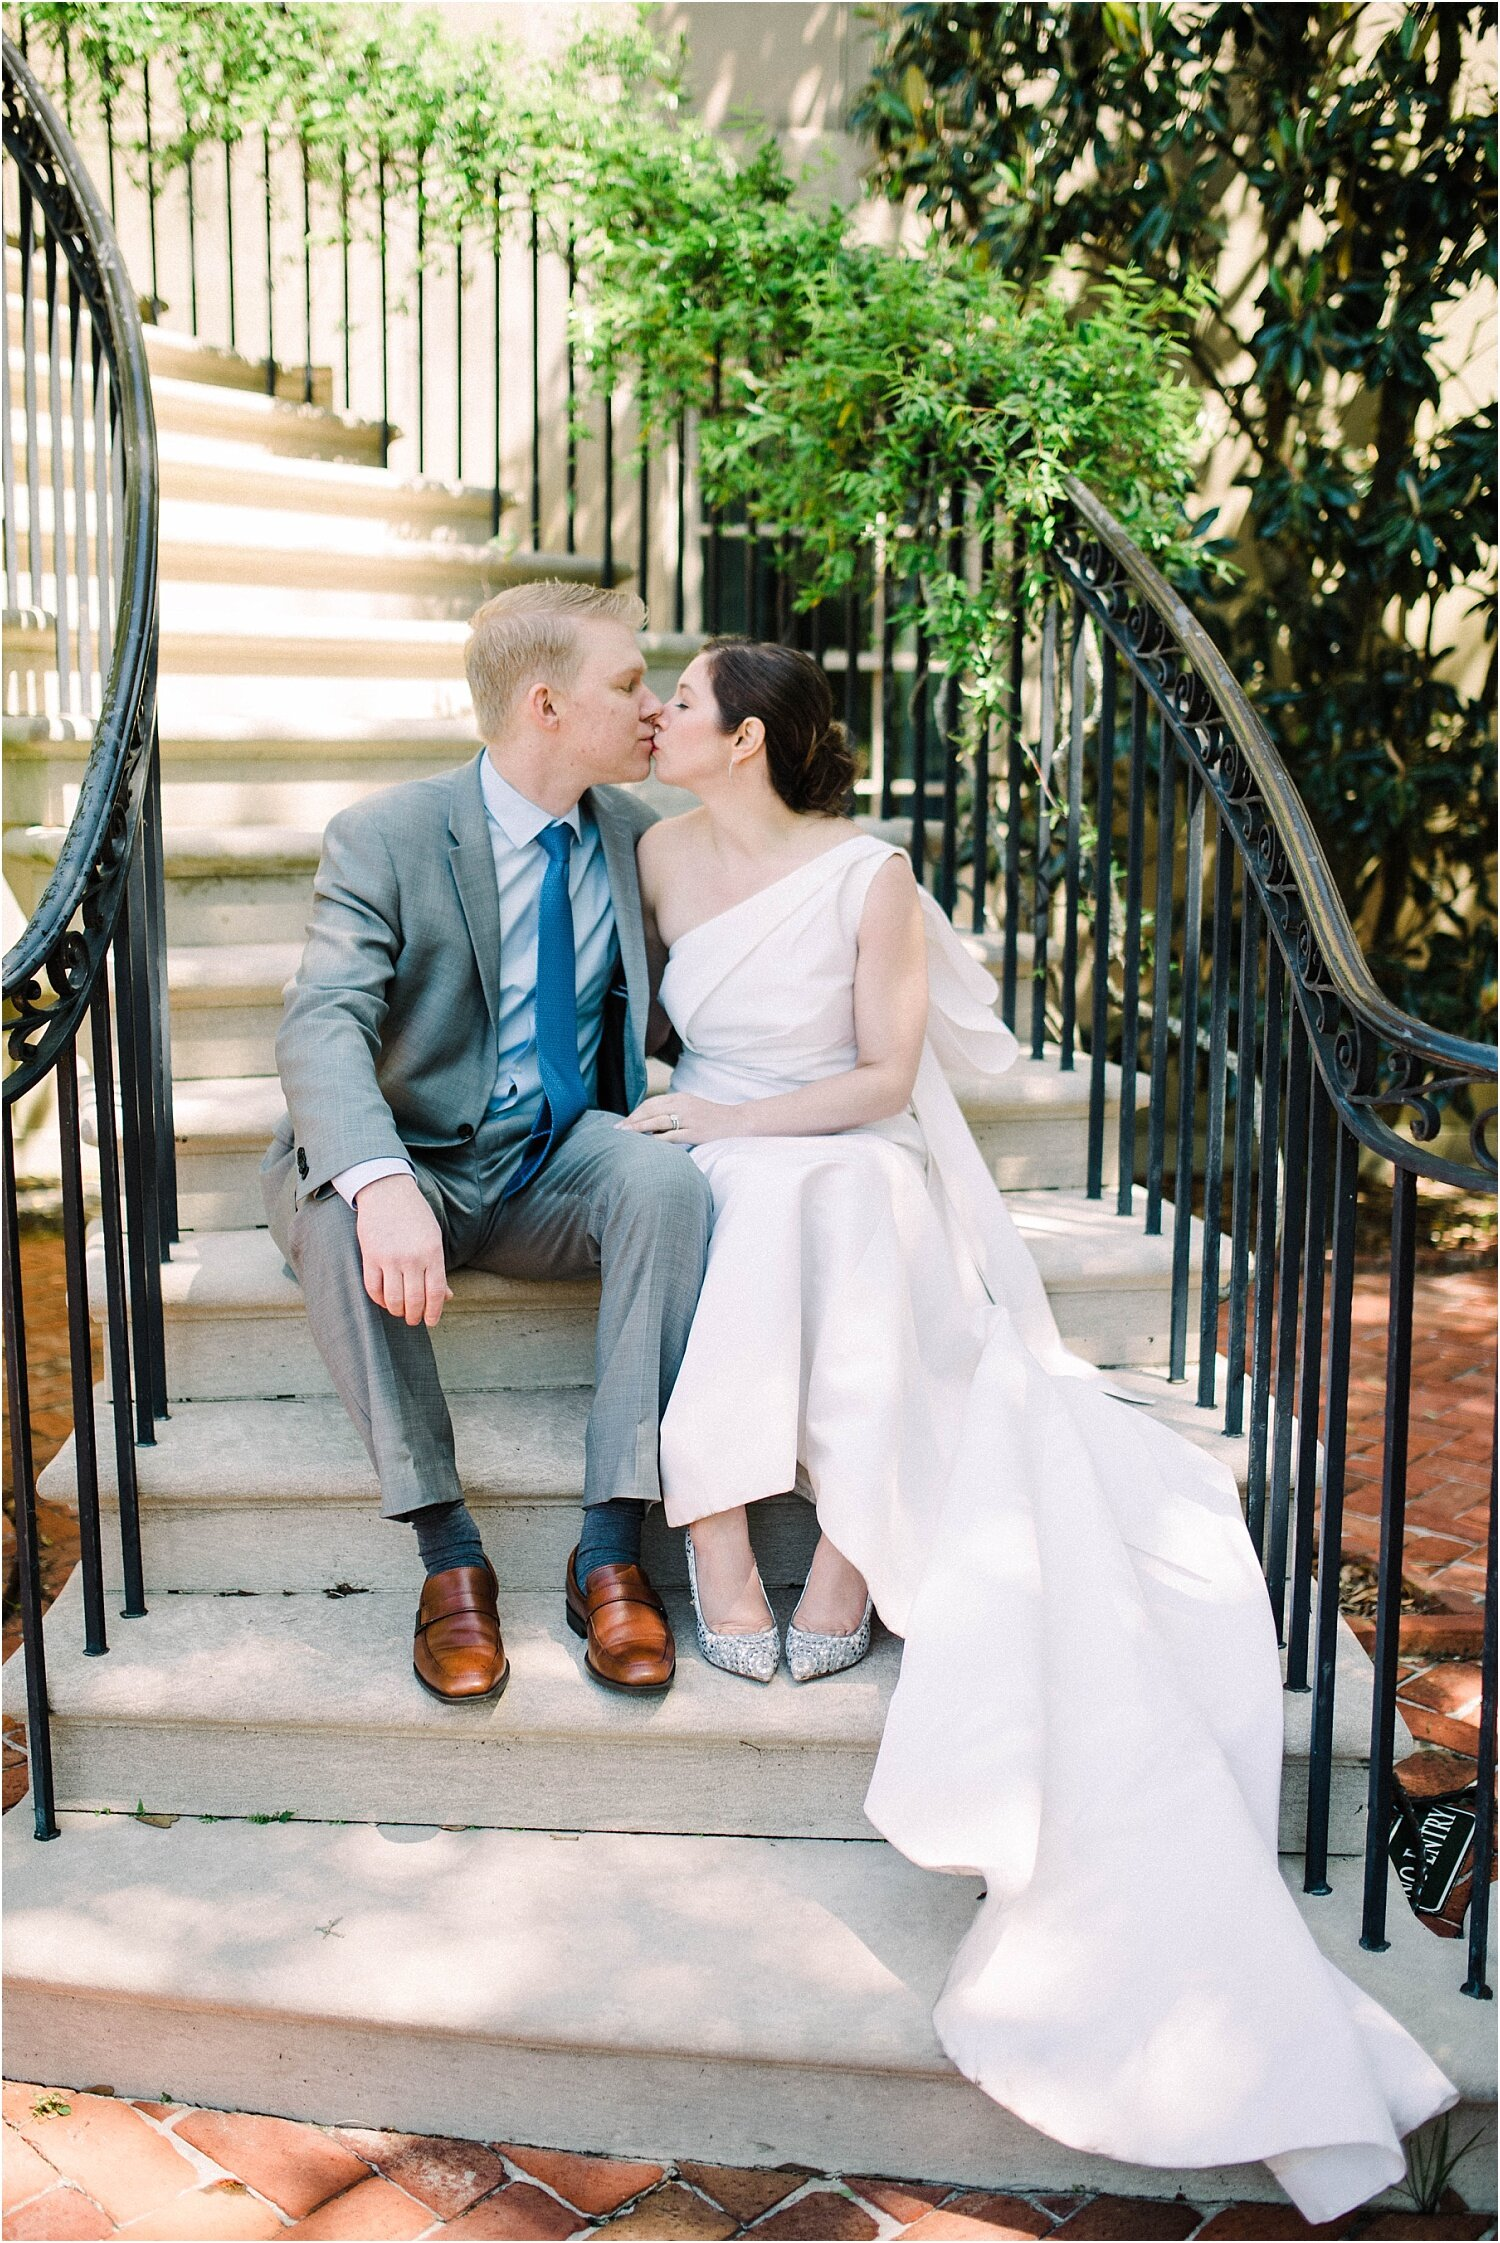 Heather + Scott-Longue-Vue-house-and-gardens-black-tie-wedding-photos_Gabby Chapin_Print_0131_BLOG.jpg